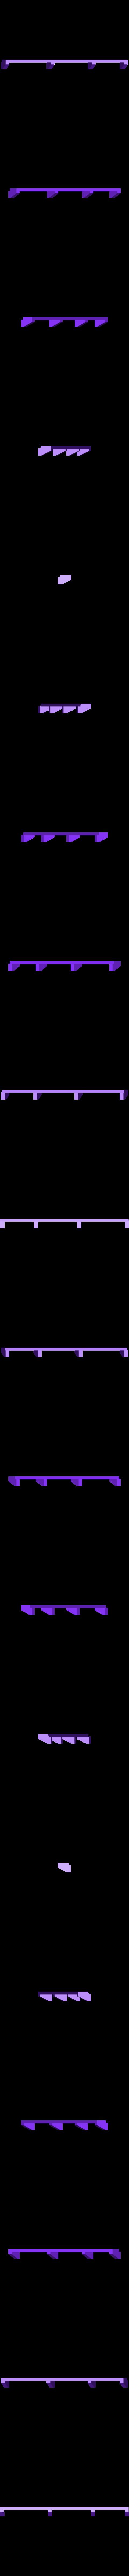 Run_Board_Back-A.STL Download free STL file 4-8-8-4 Big Boy Locomotive • 3D printer object, RaymondDeLuca